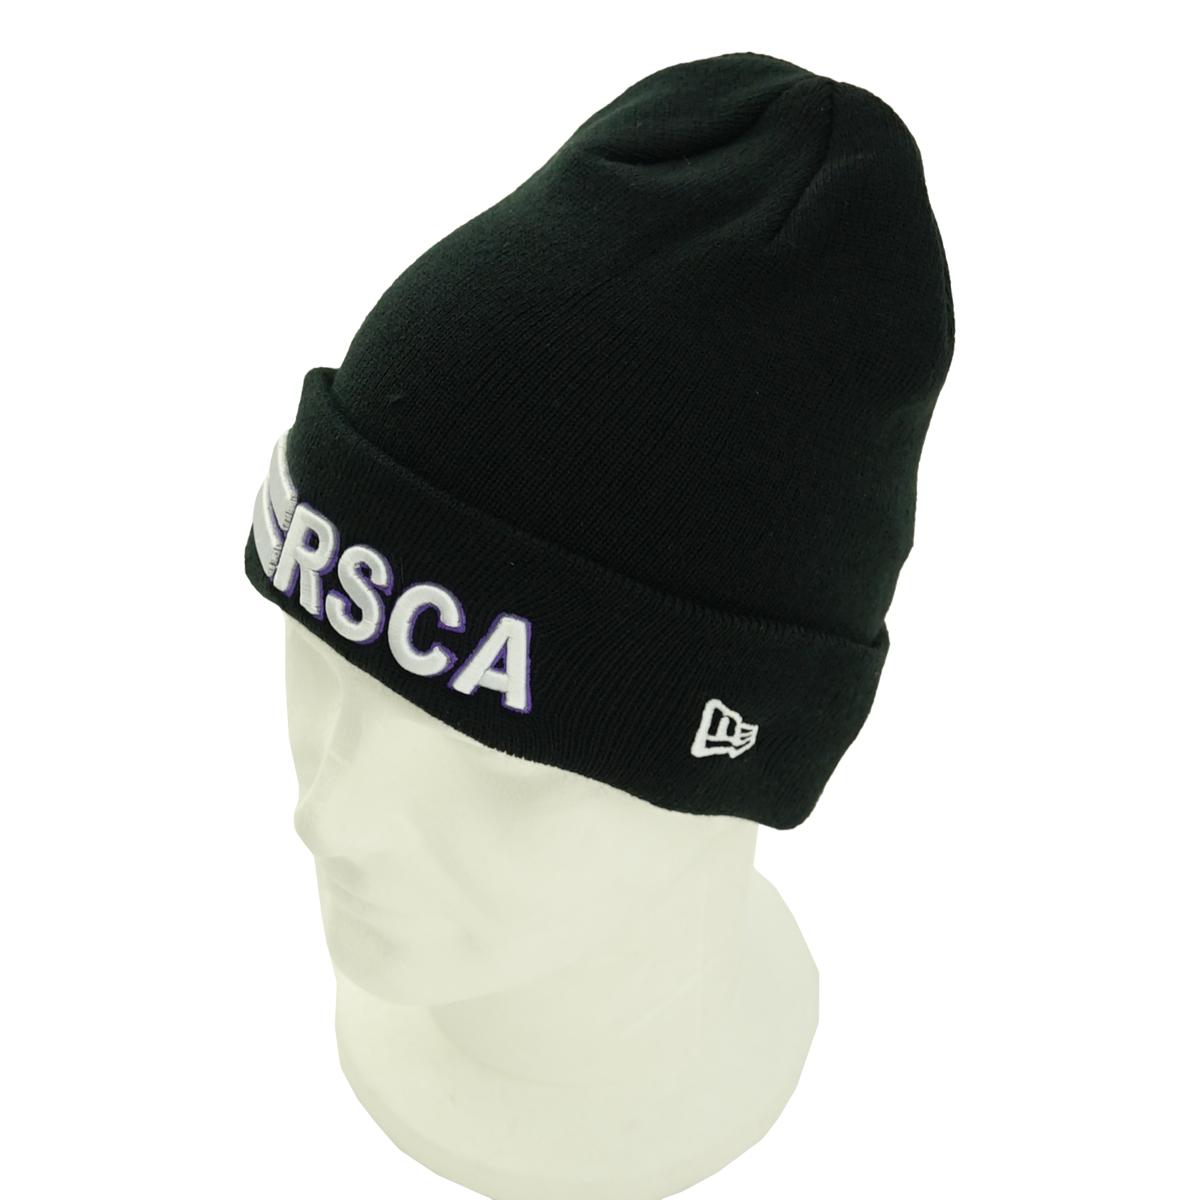 RSCA Muts Zwart RSCA